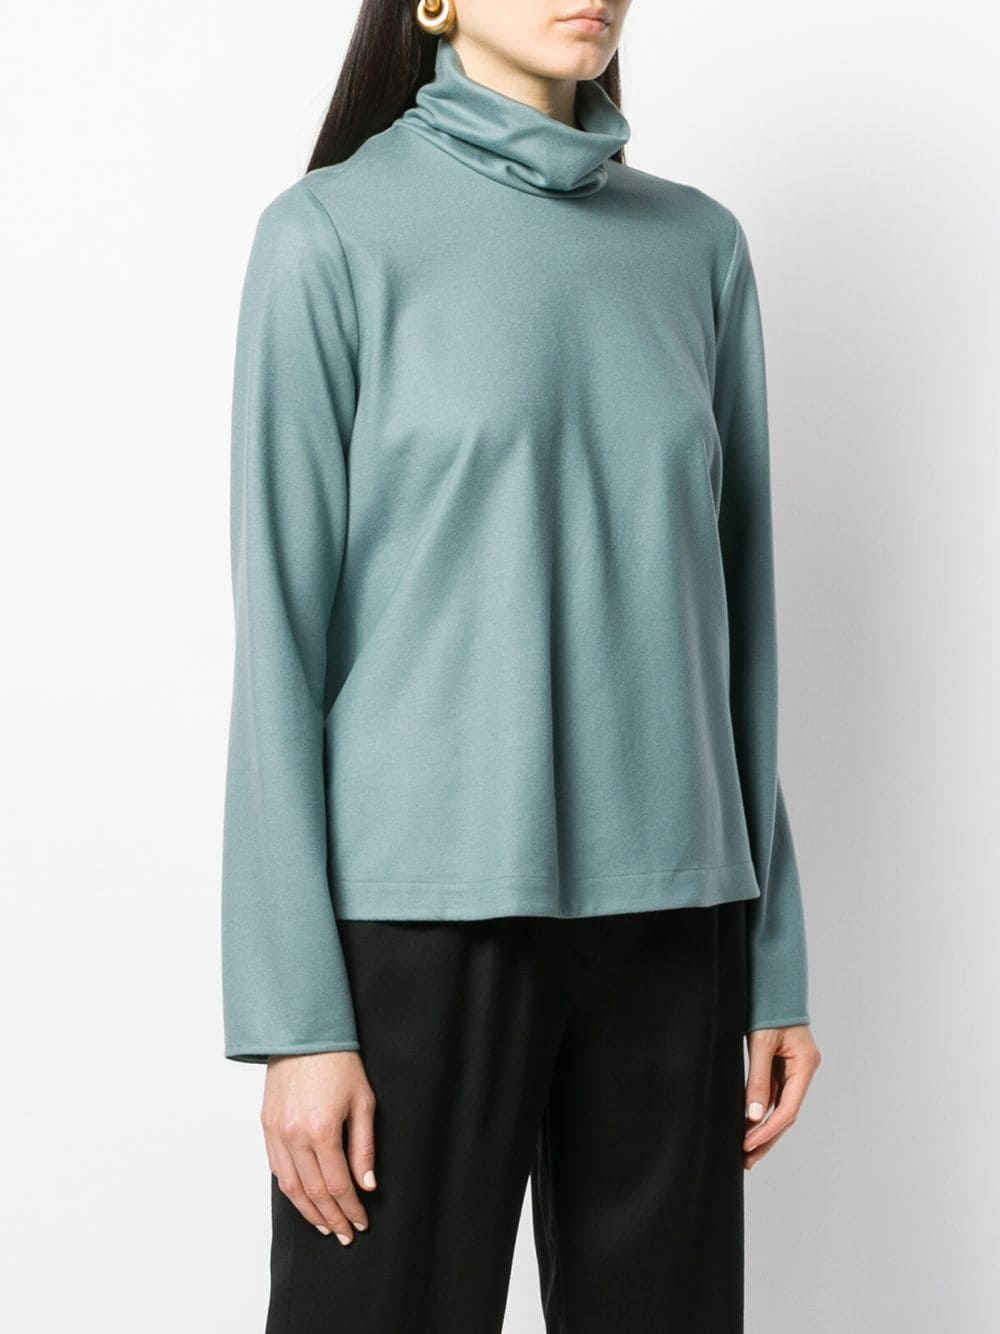 Blue wool turtleneck top featuring long sleeves FORTE_FORTE |  | 6740CARTA ZUCCHERO